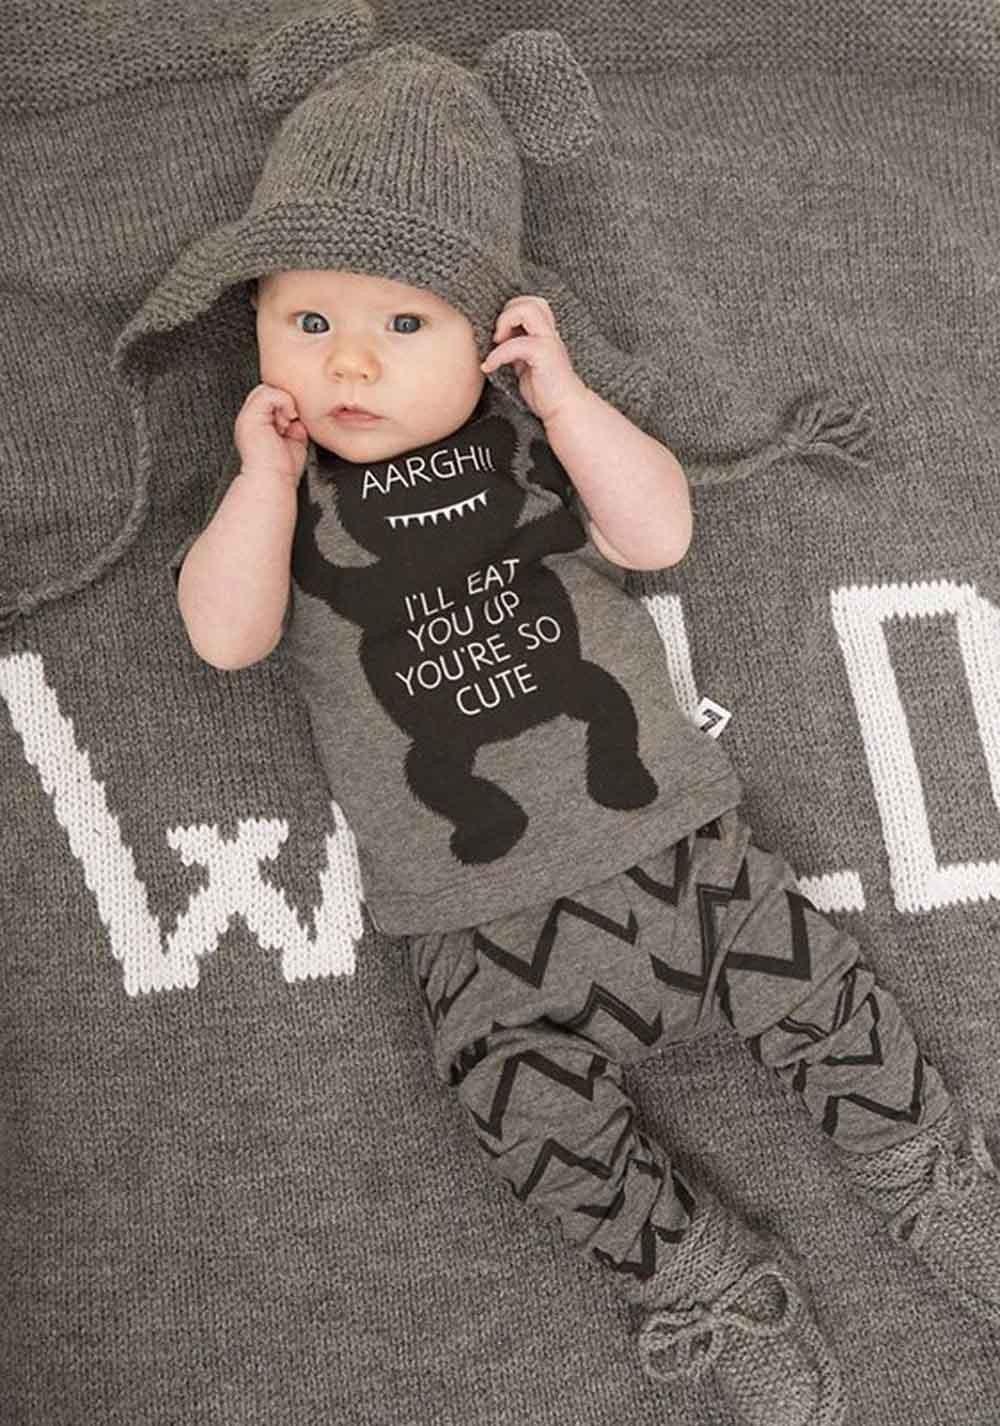 2015-New-Autumn-Baby-Cotton-Little-Monster-Clothes-2pcs-Top+Pants-Sport-Suits-Infant-Boys-And-Girls-Clothing-Sets-CL0769 (5)